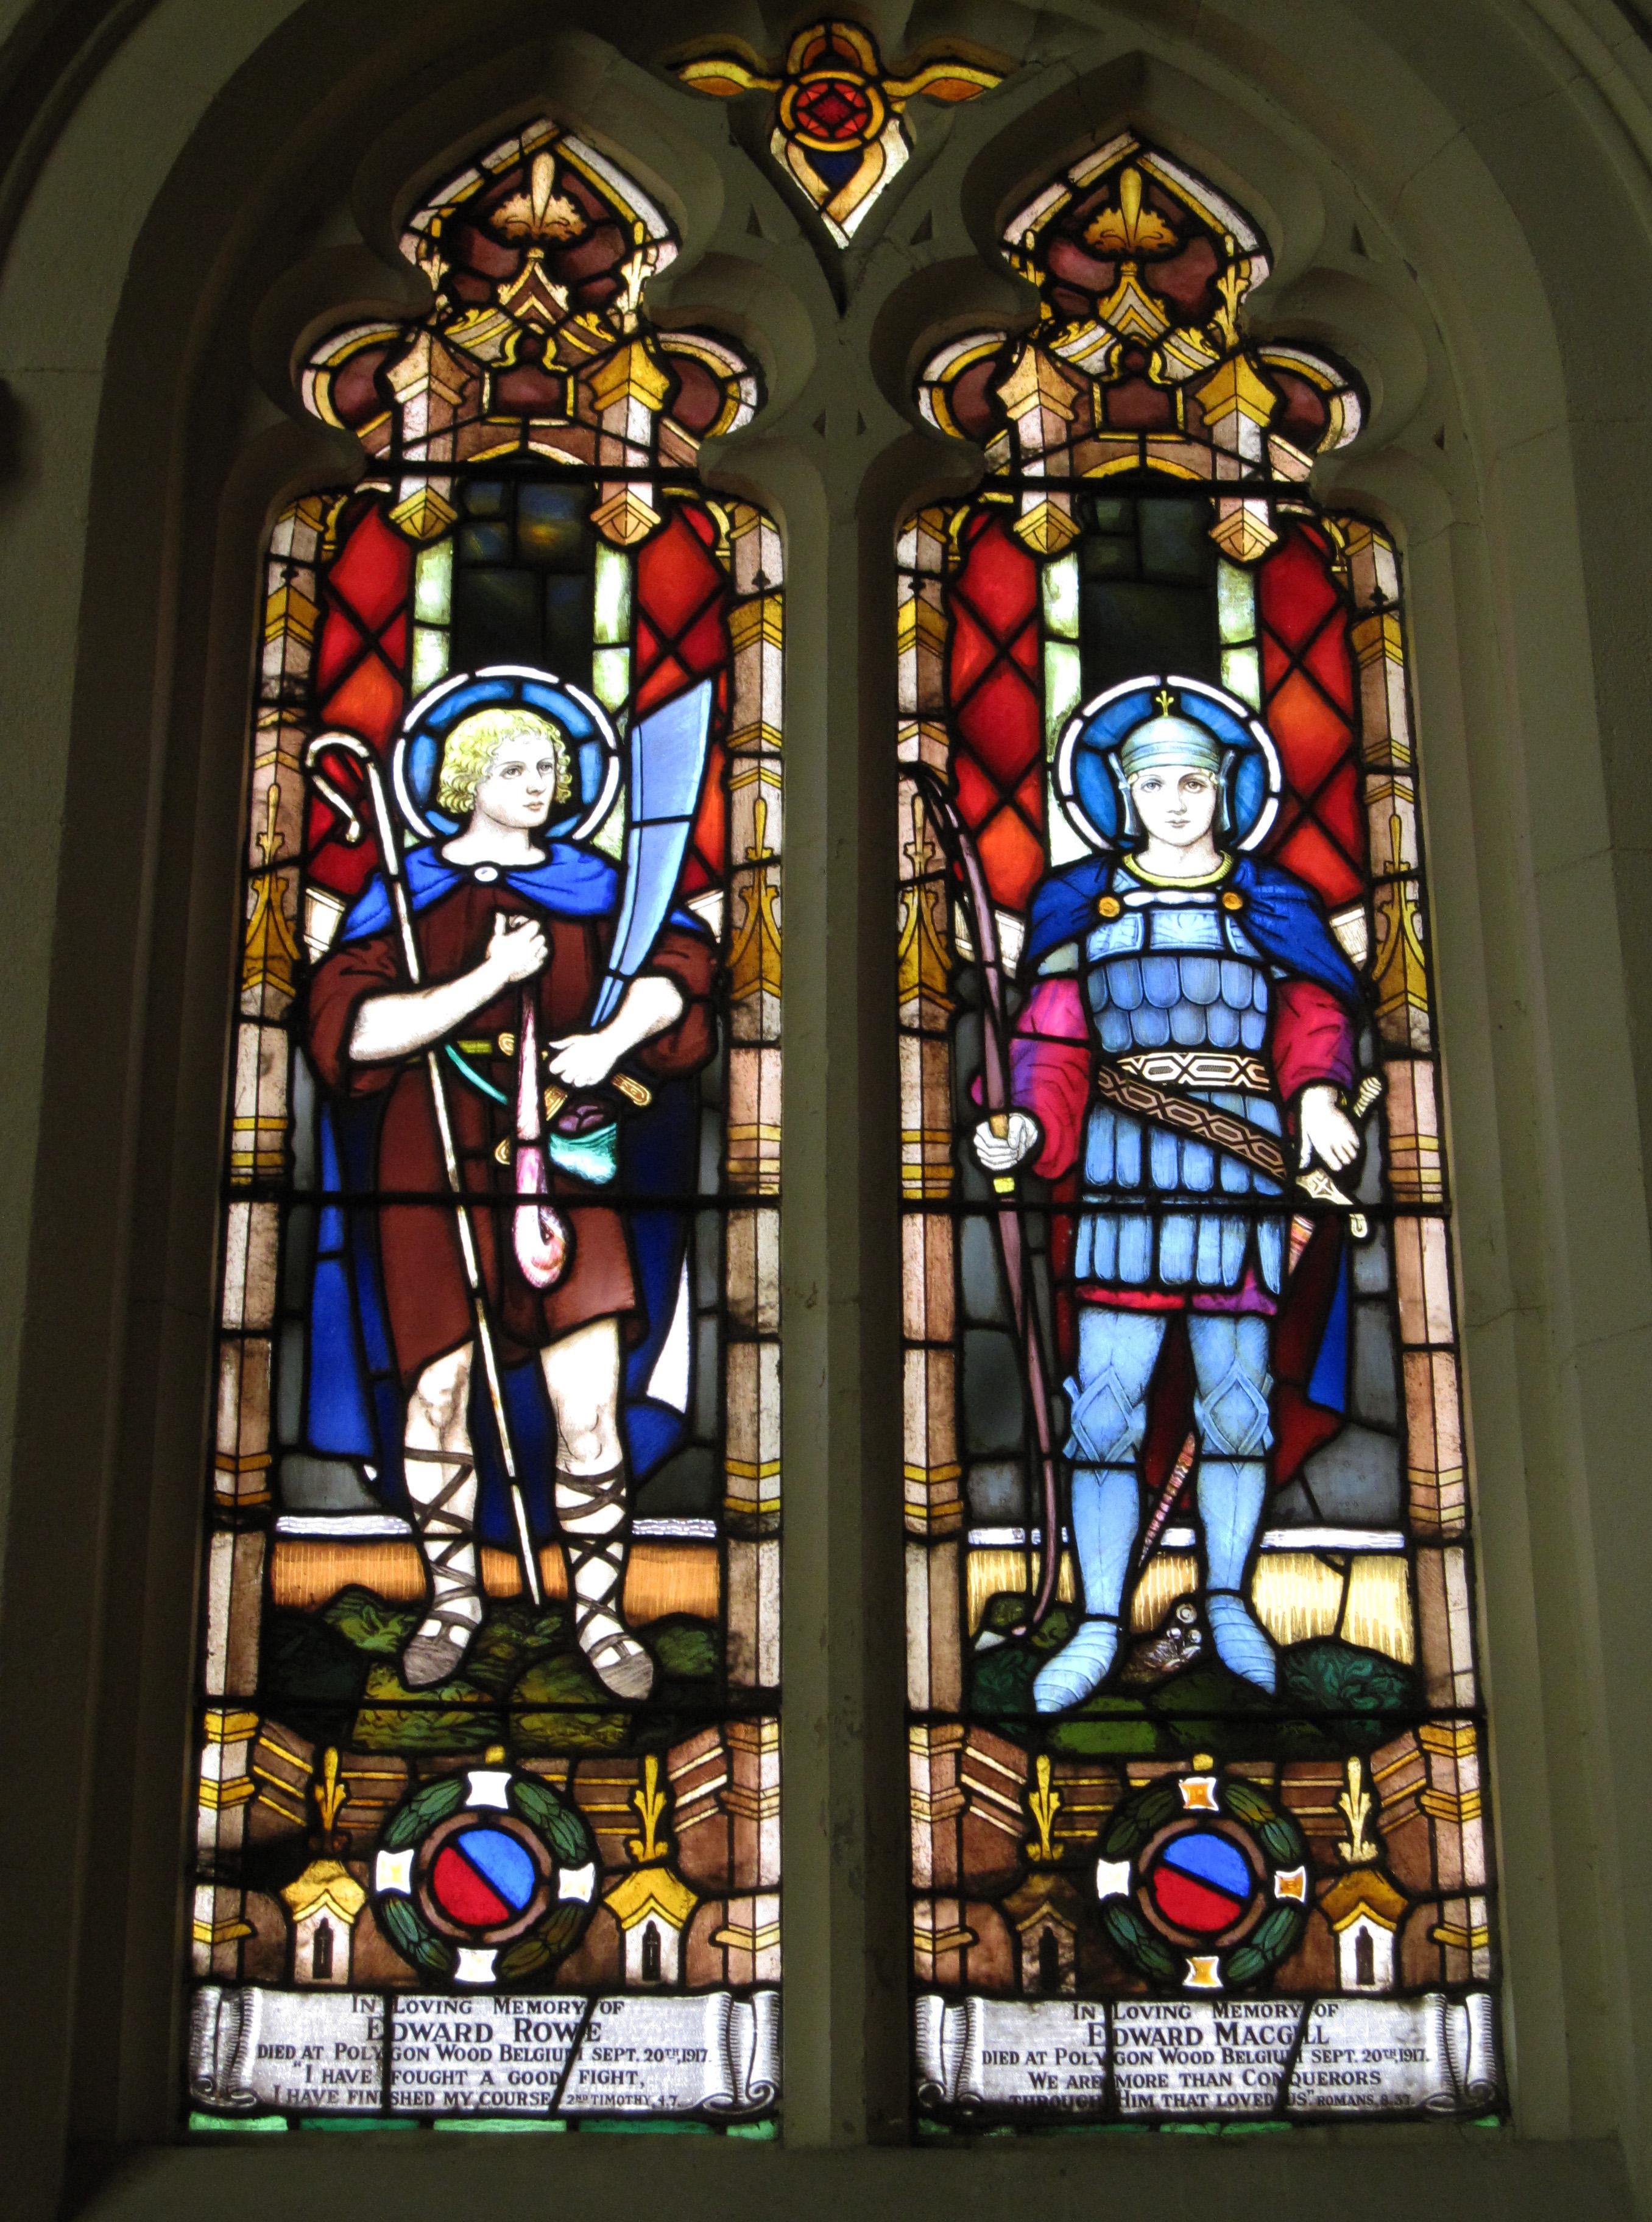 St Johns Uniting David and Jonathan